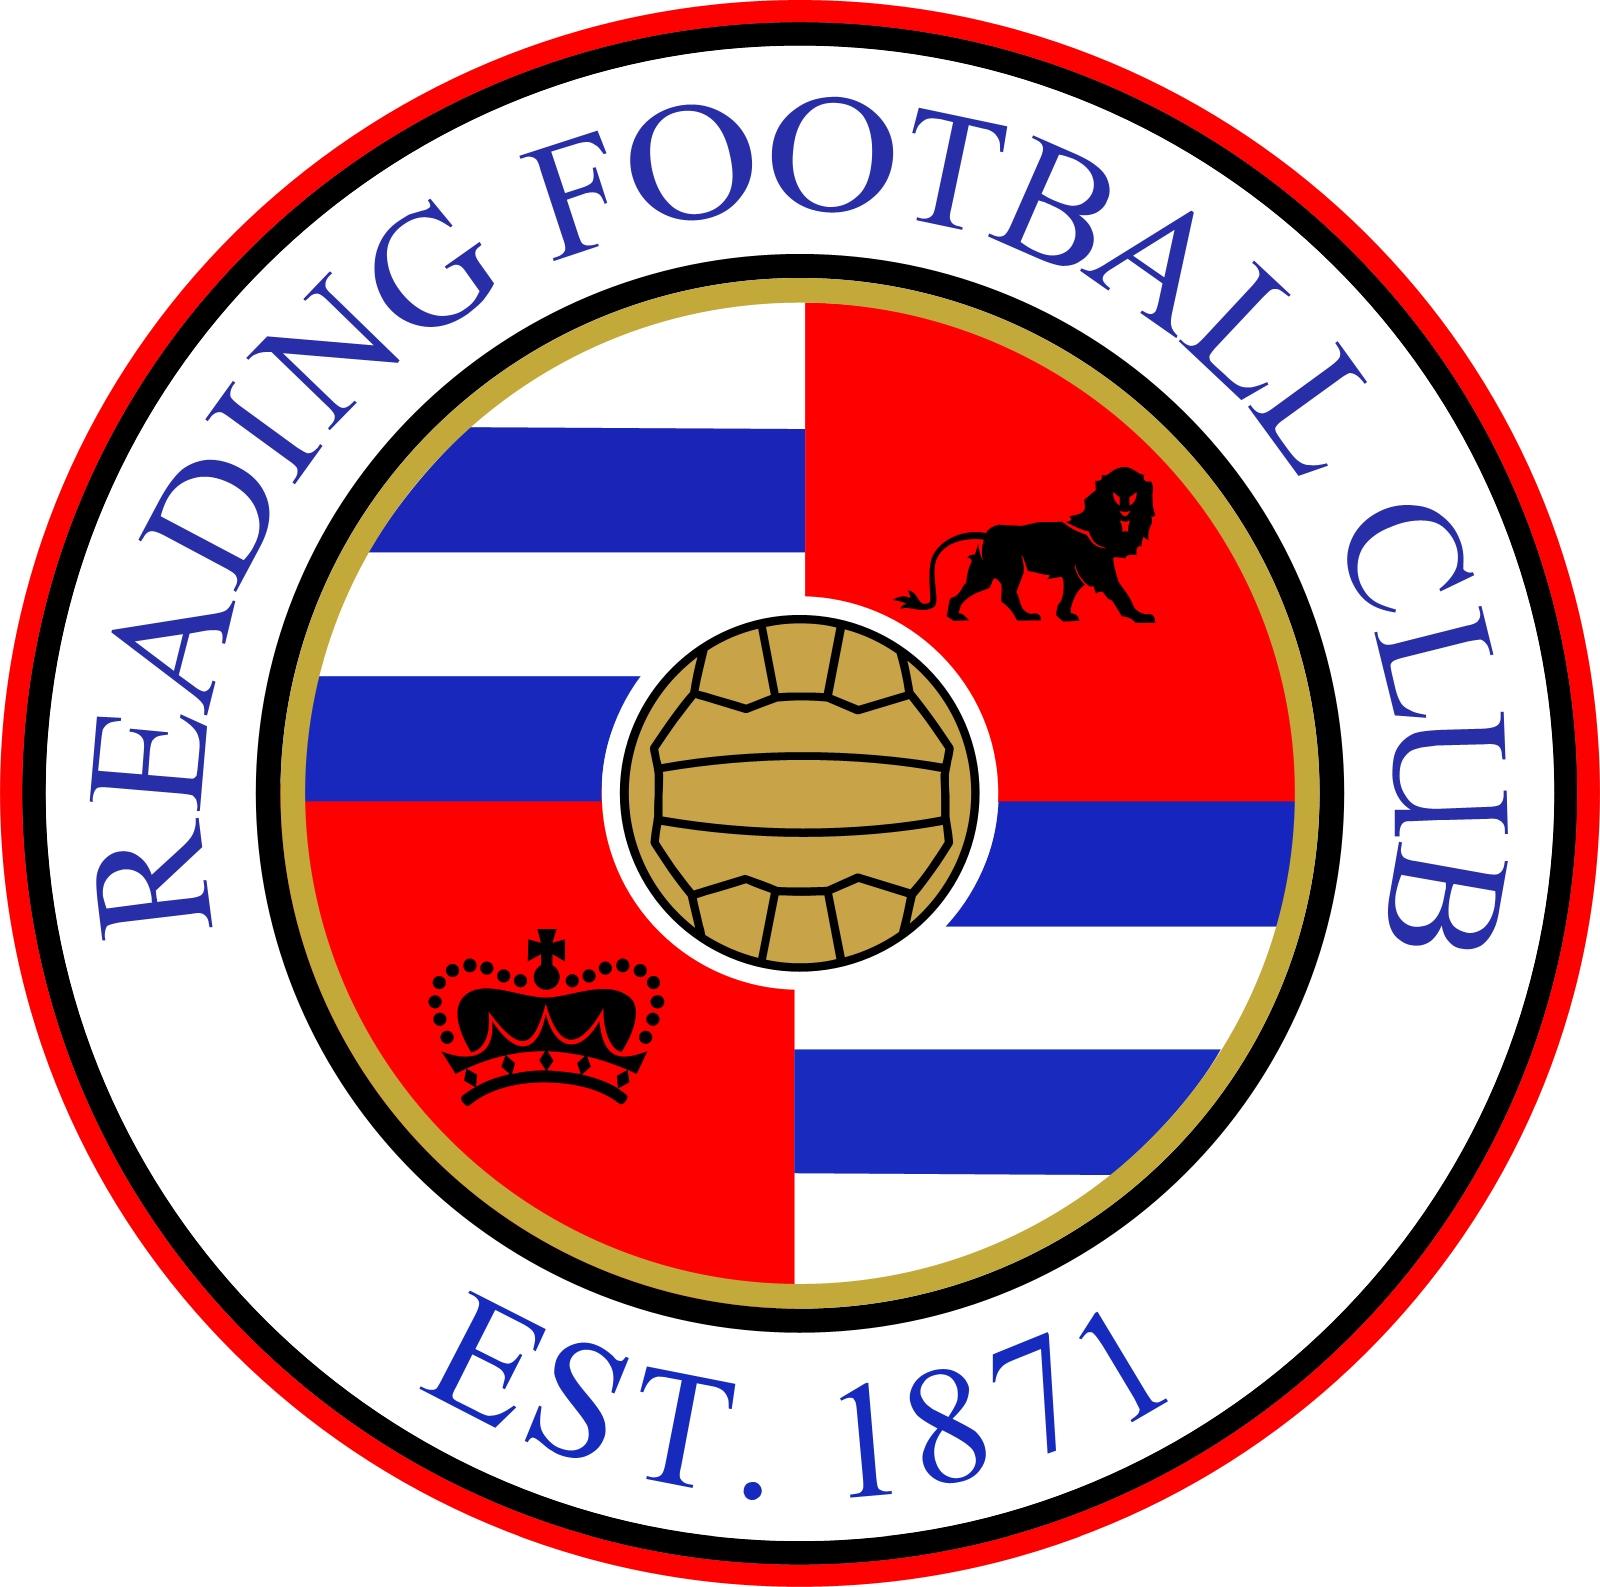 Barnsley 1-1 Reading